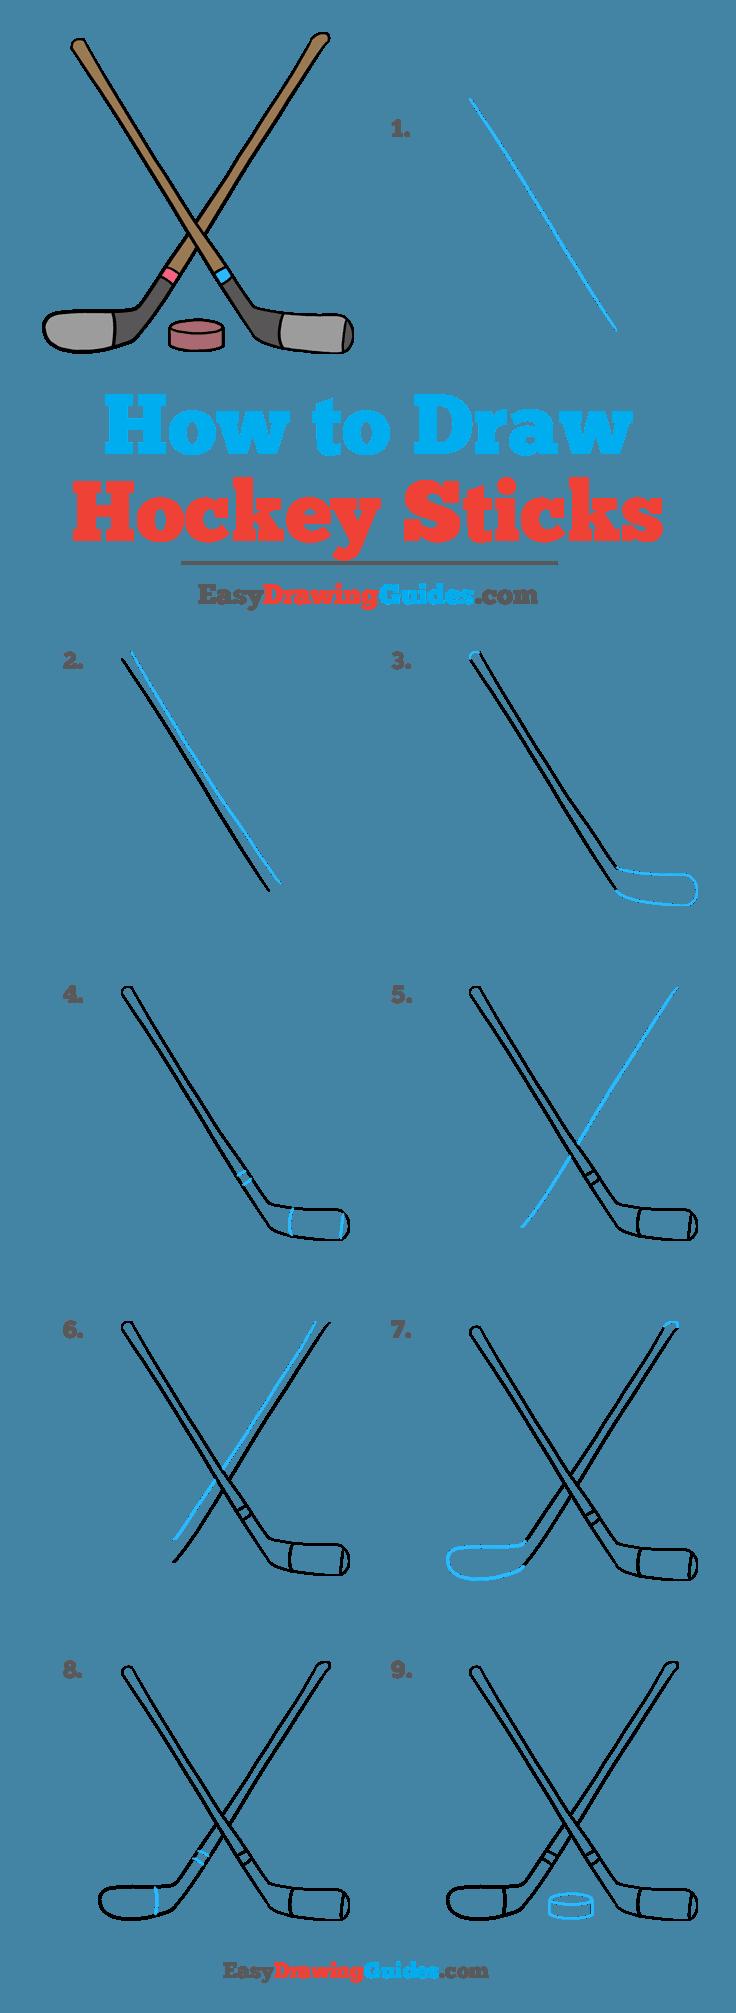 How to Draw a Hockey Sticks Step by Step Tutorial Image